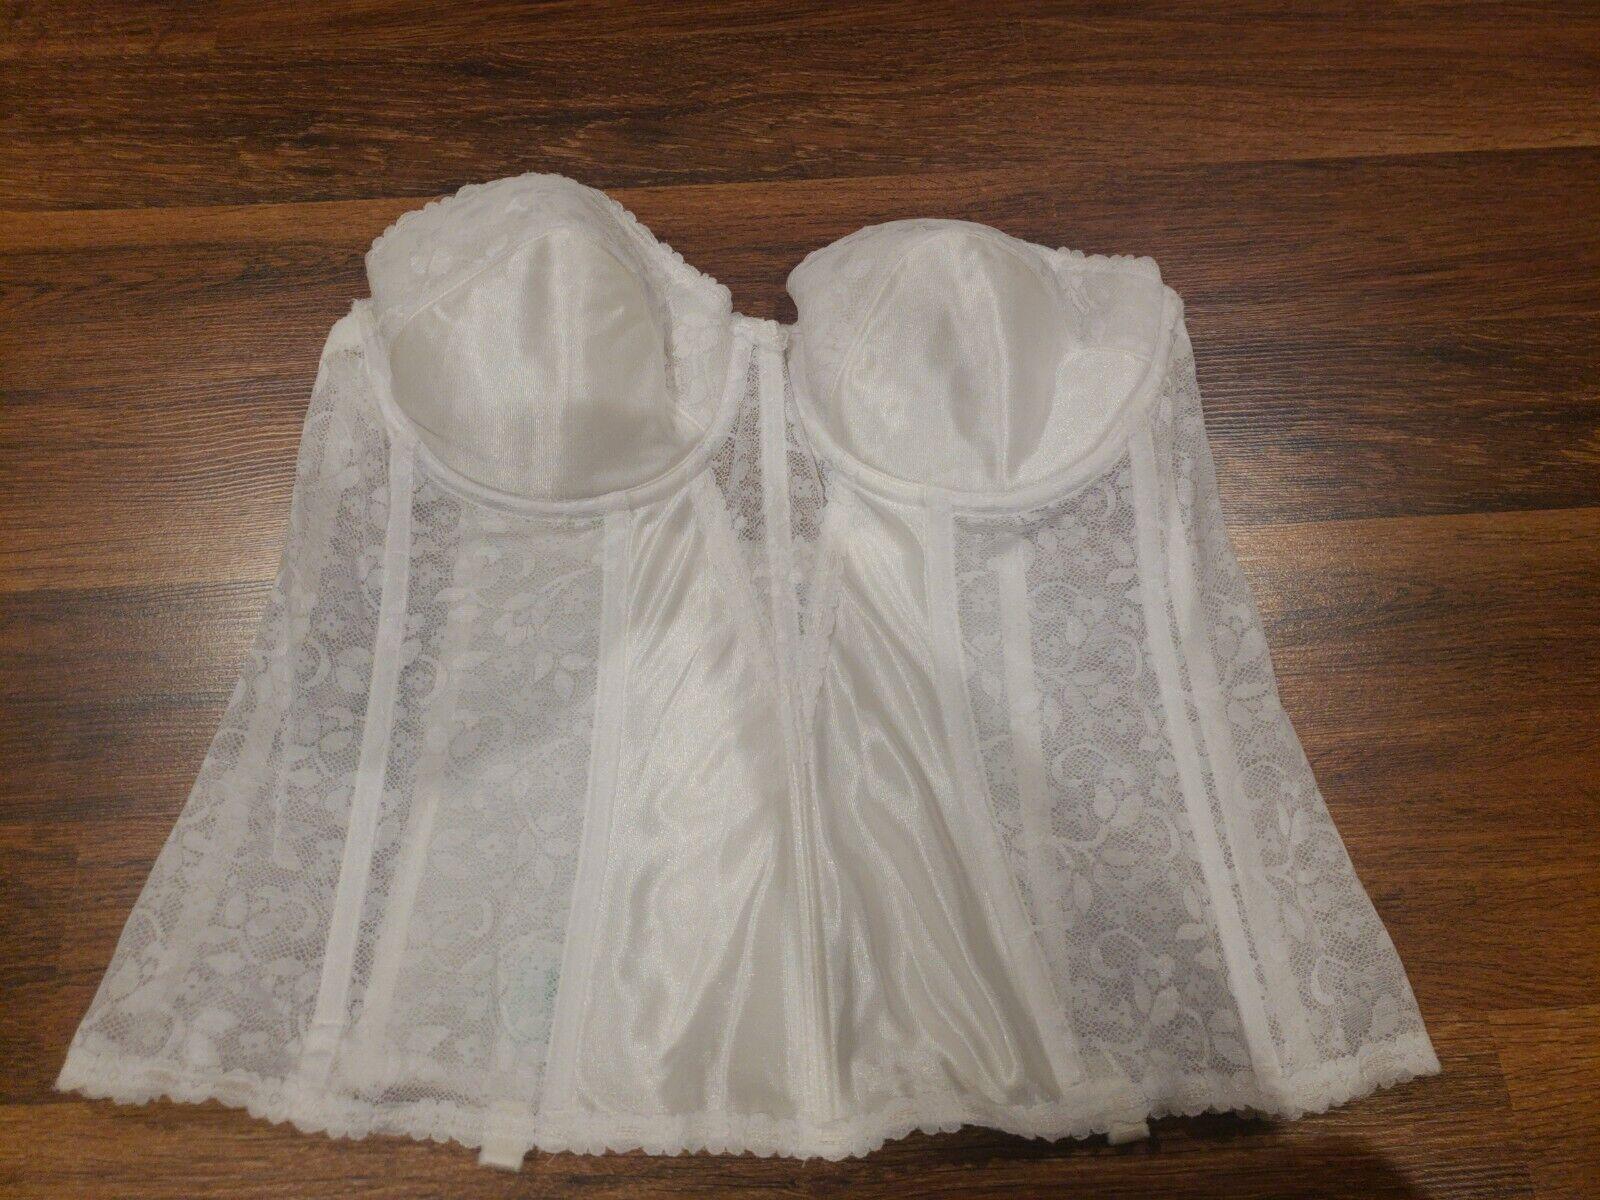 Vintage Carnival Corset Lace White Size 42B - image 2